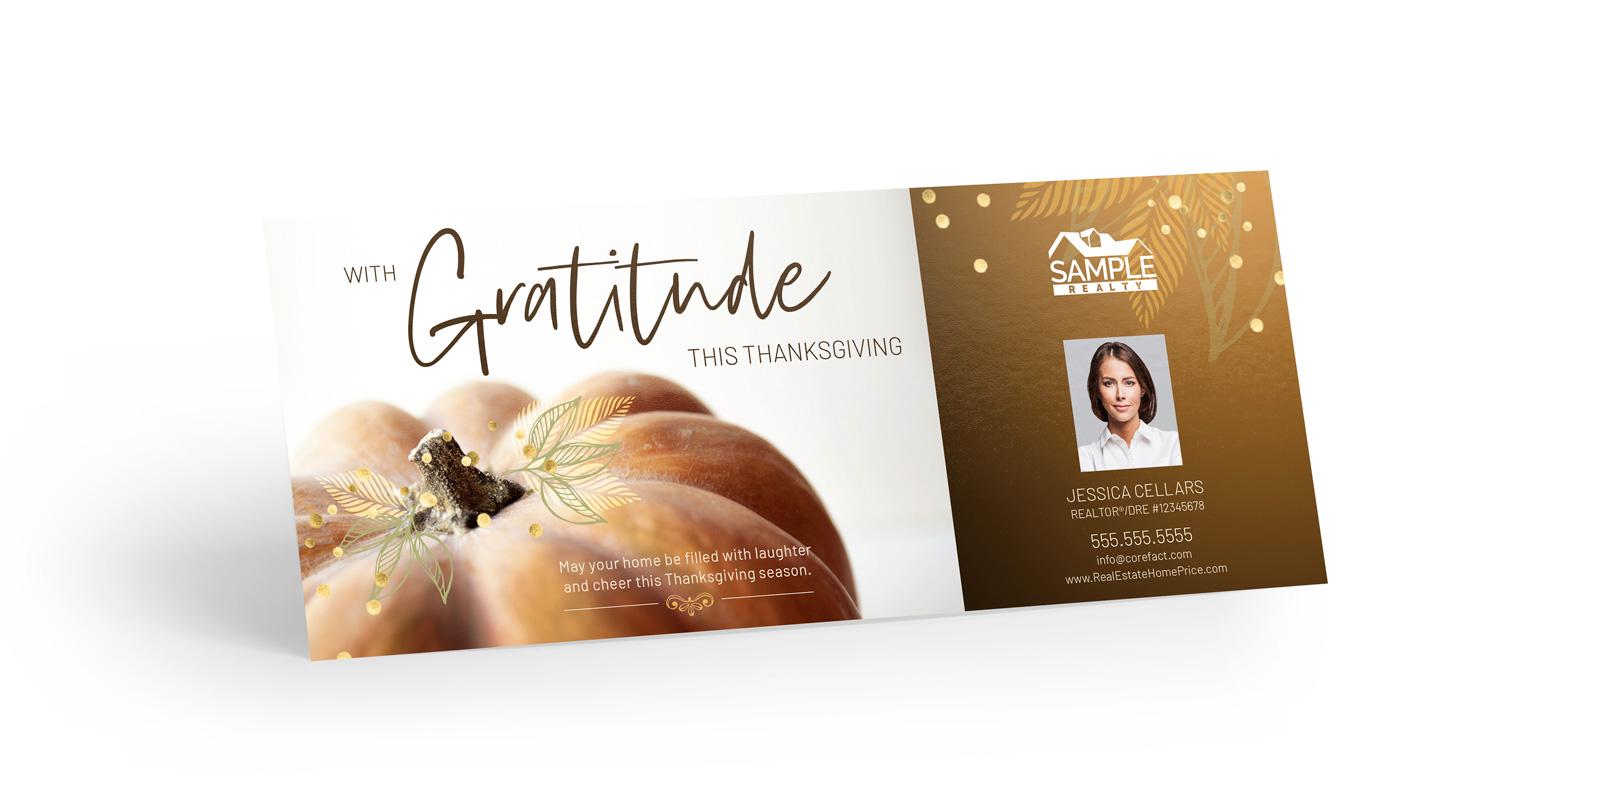 Corefact Seasonal - Thanksgiving Gratitude